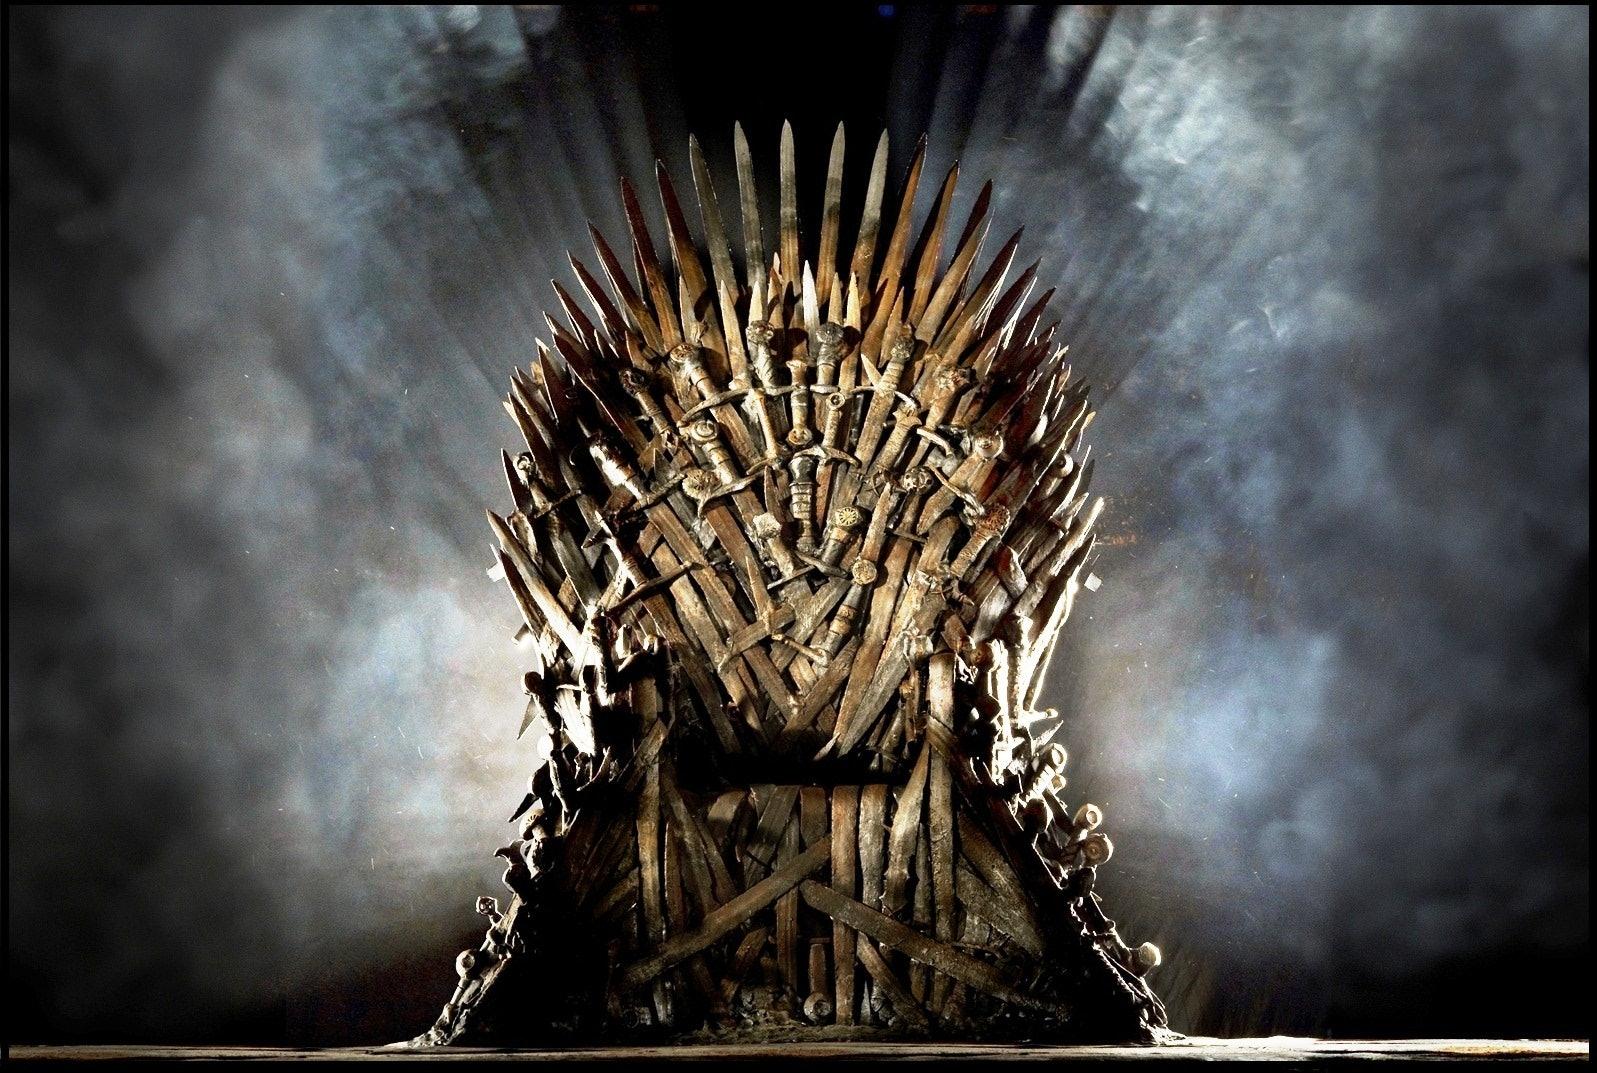 game-of-thrones-photoshop-tutorial-photo-retouching-sample